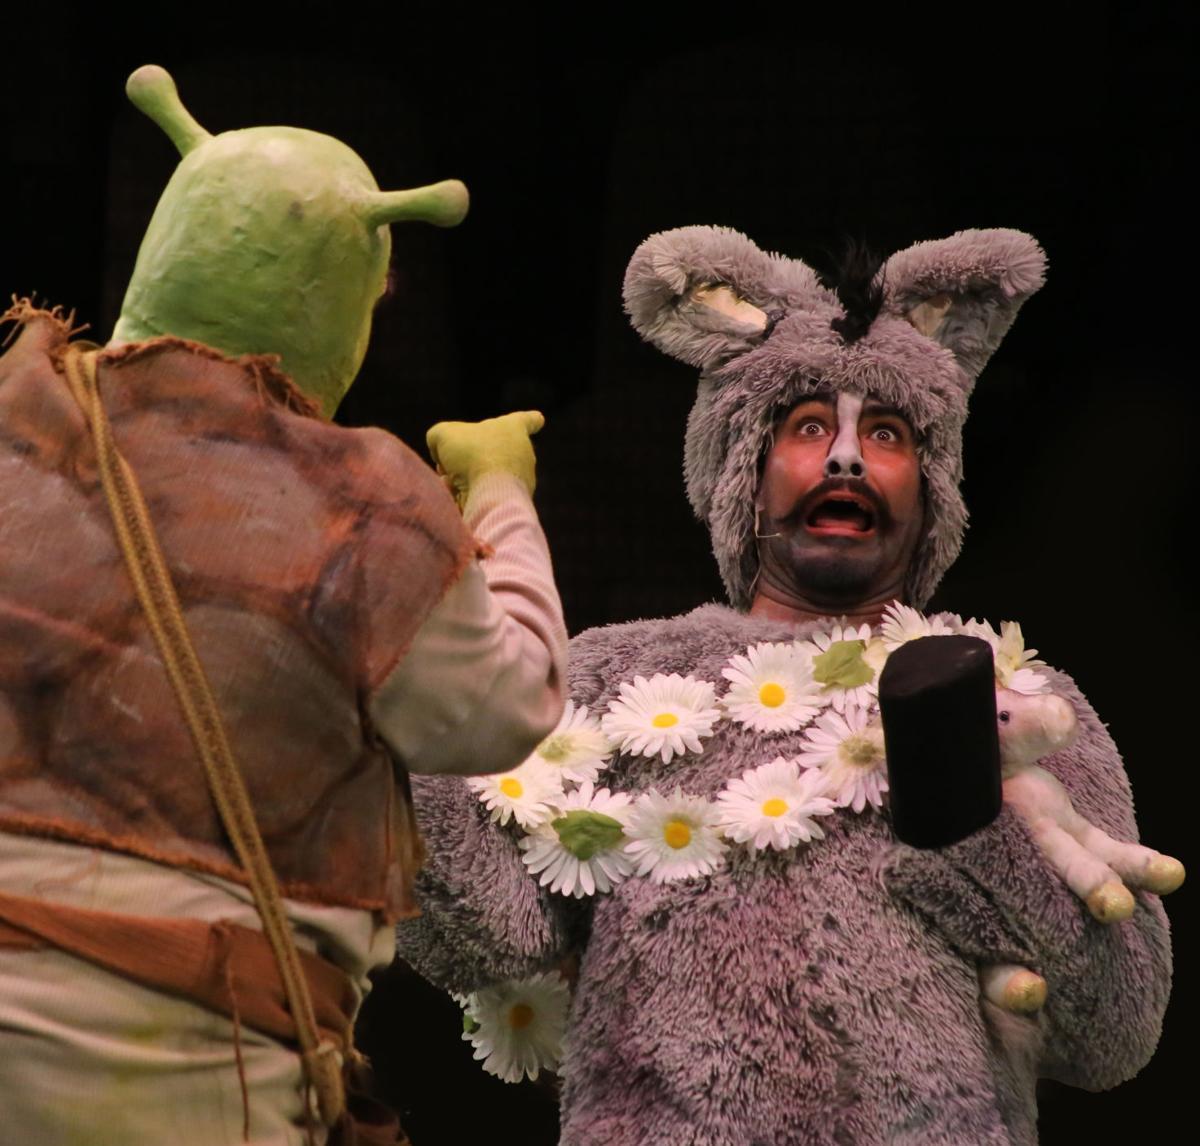 Shrek 3 Donkey and Shrek.jpg